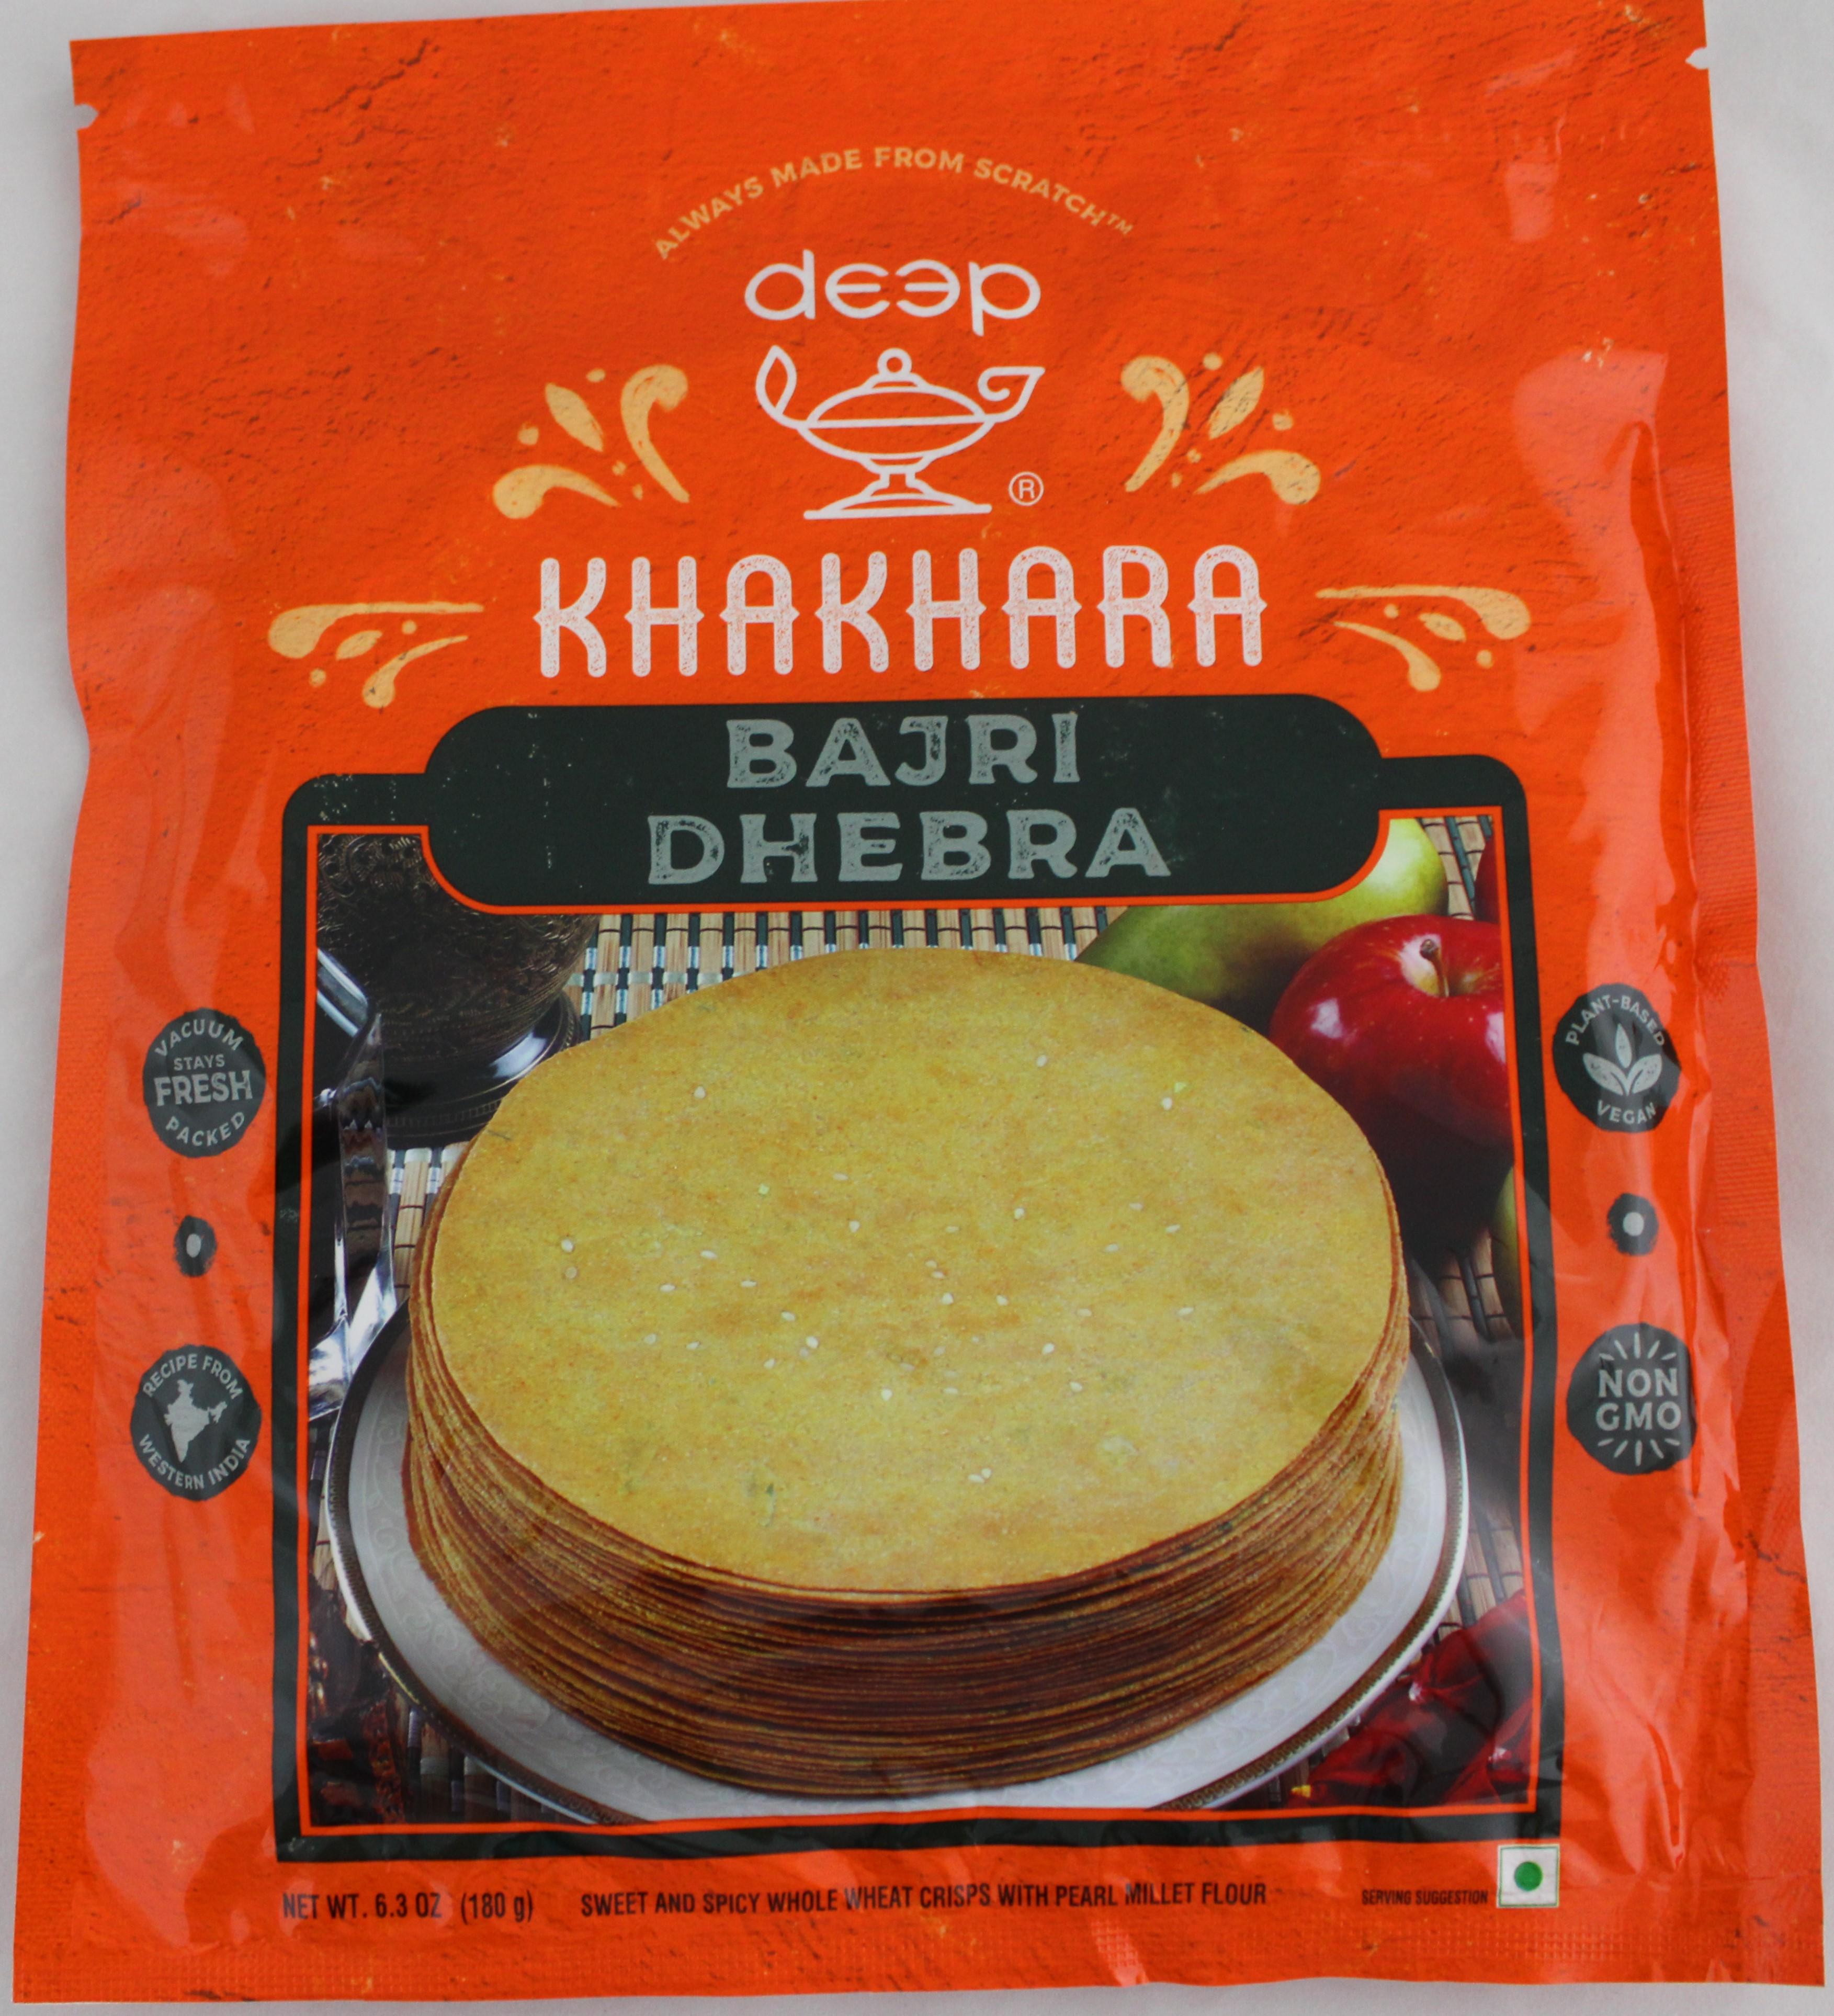 Bajri Dhebra Khakhra 6.3oz.